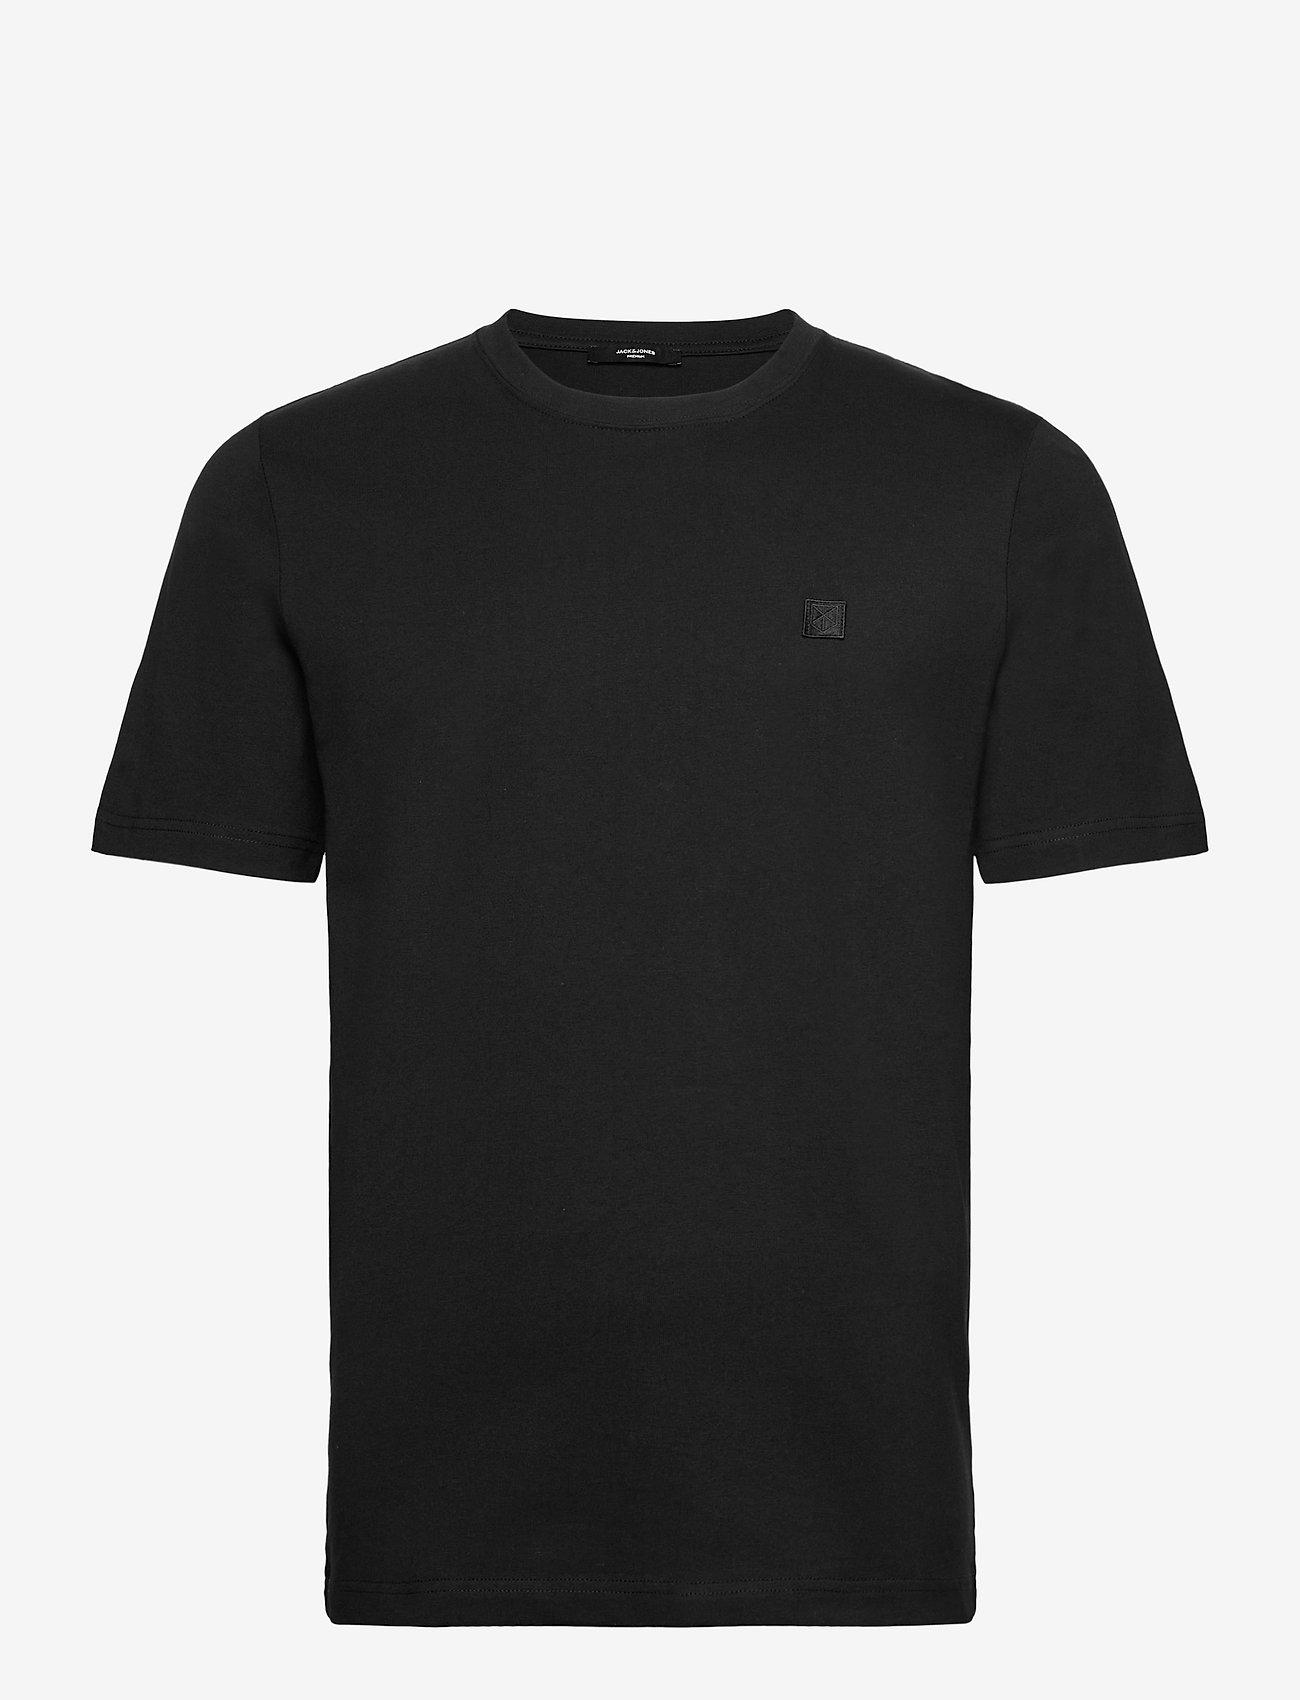 Jack & Jones - JPRBLASTUDIO SS TEE SOLID LTN - kortärmade t-shirts - black - 0